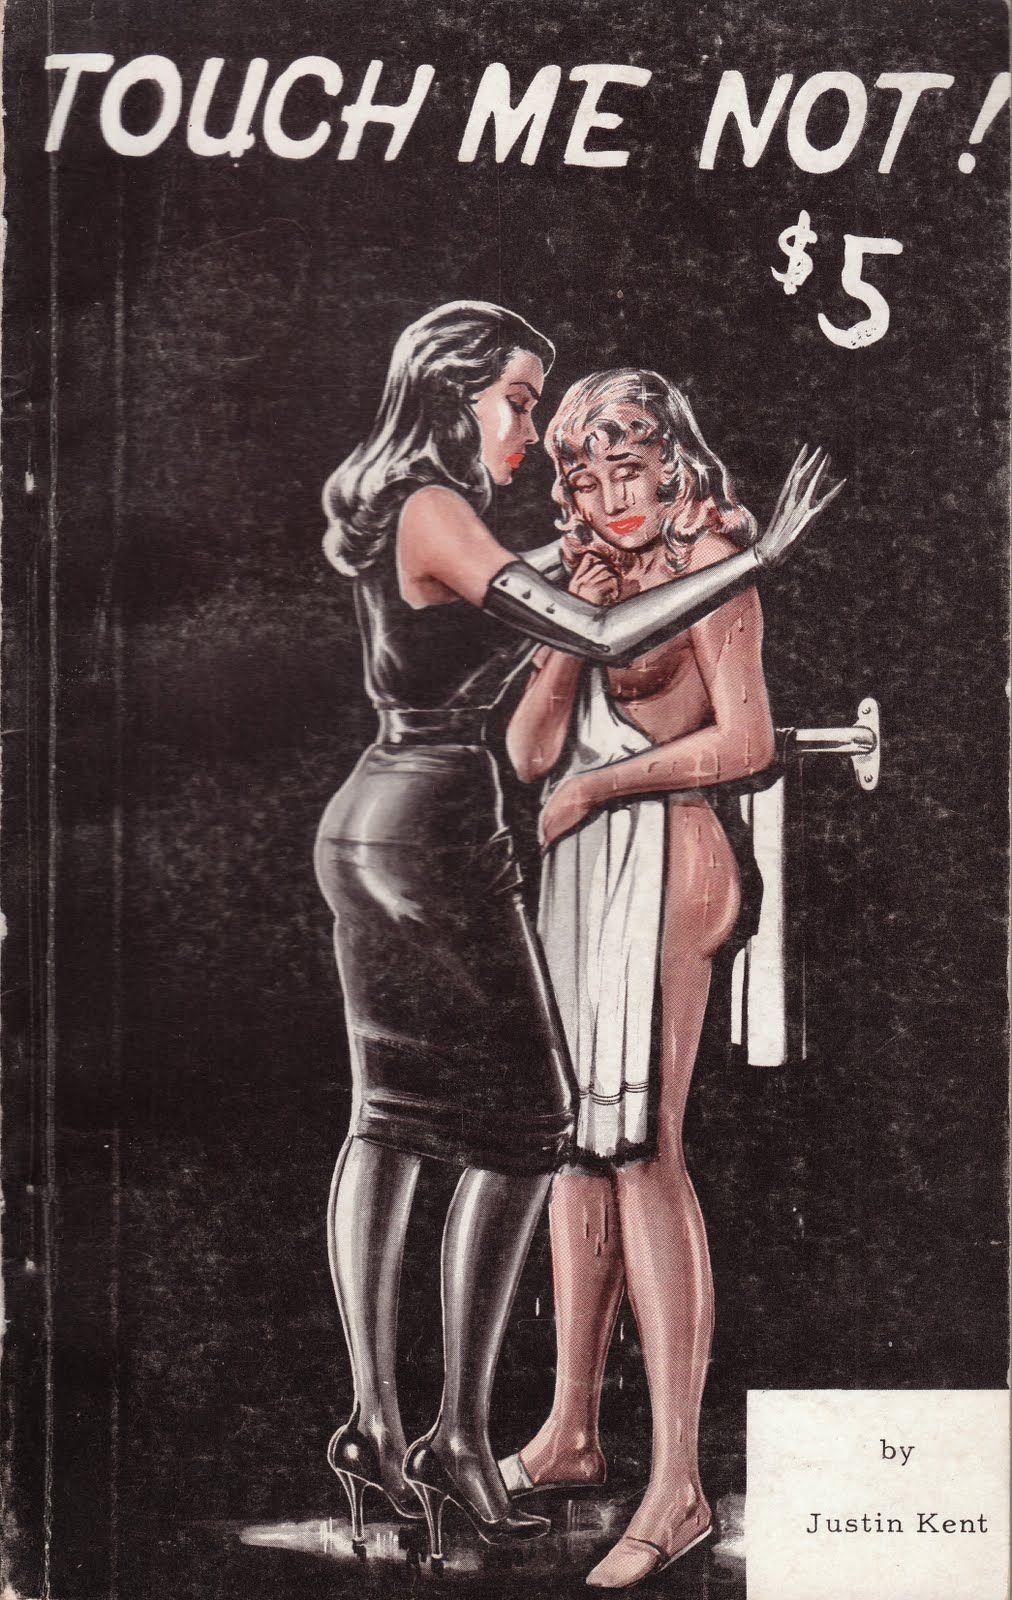 Not a lesbian erotica